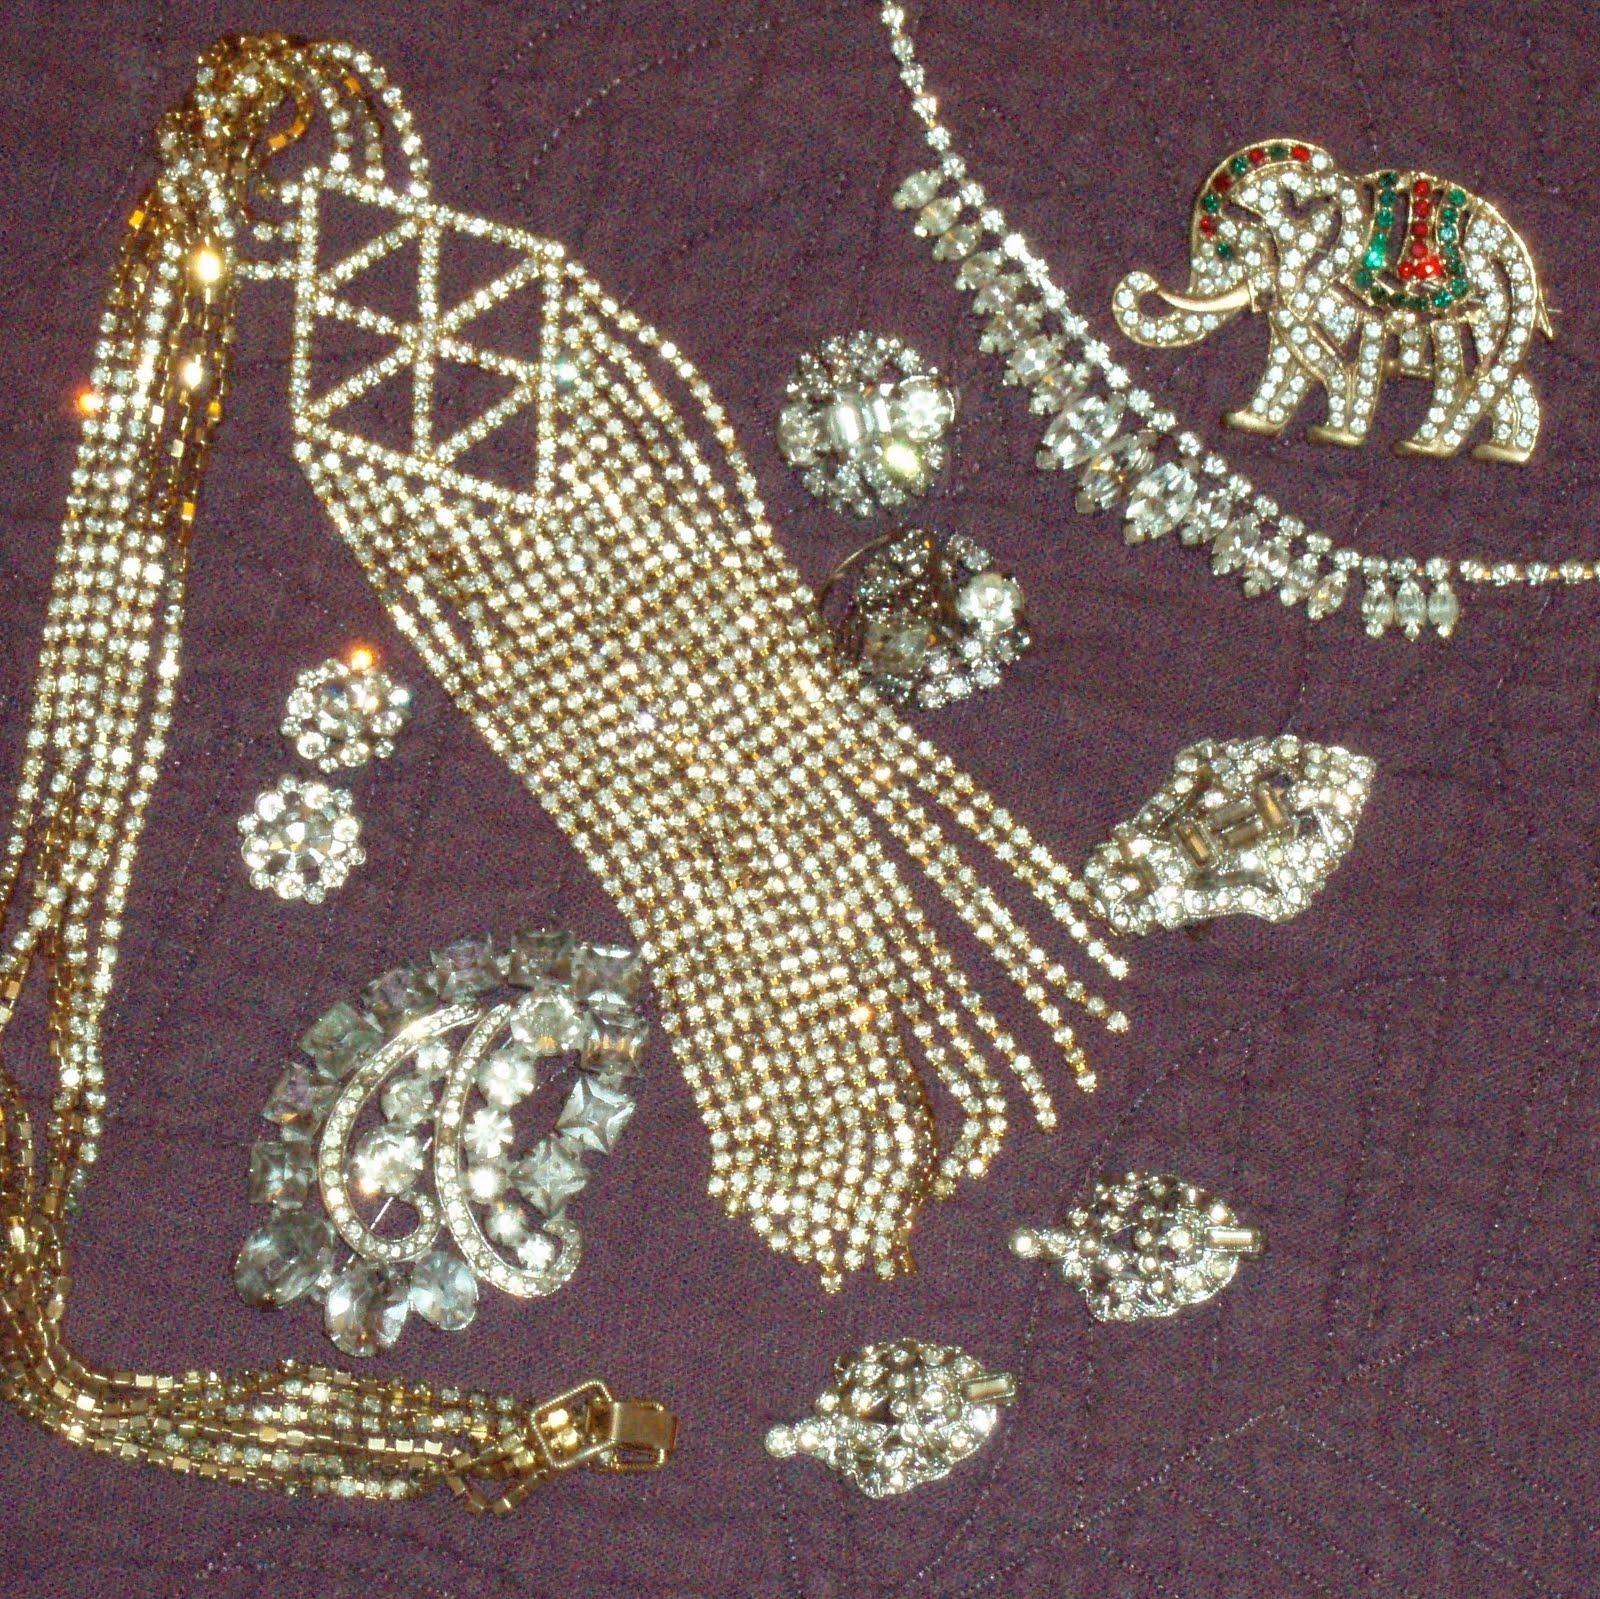 How To Clean Vintage Rhinestone Jewelry 108